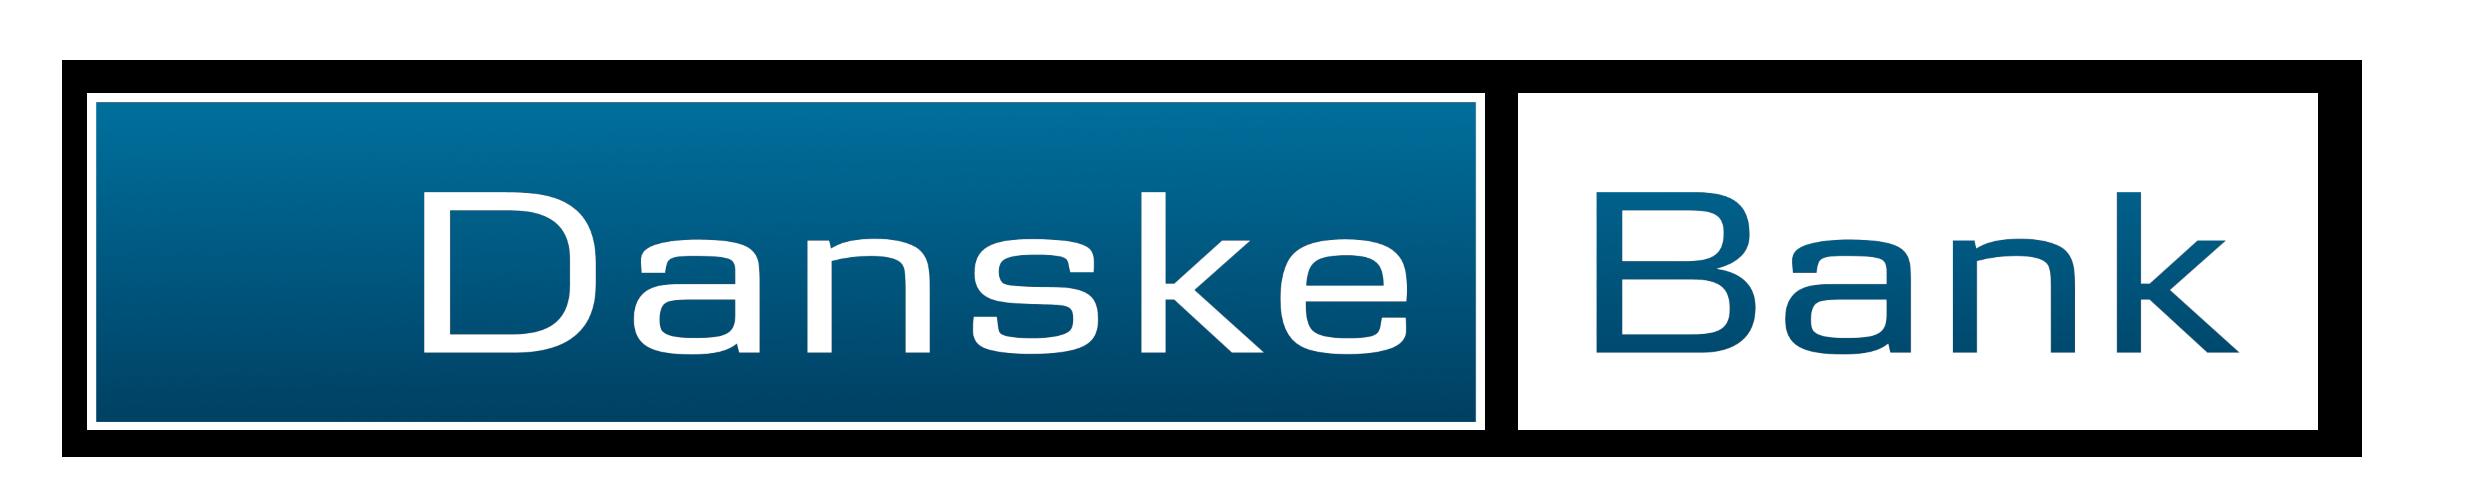 Danske Bank.png